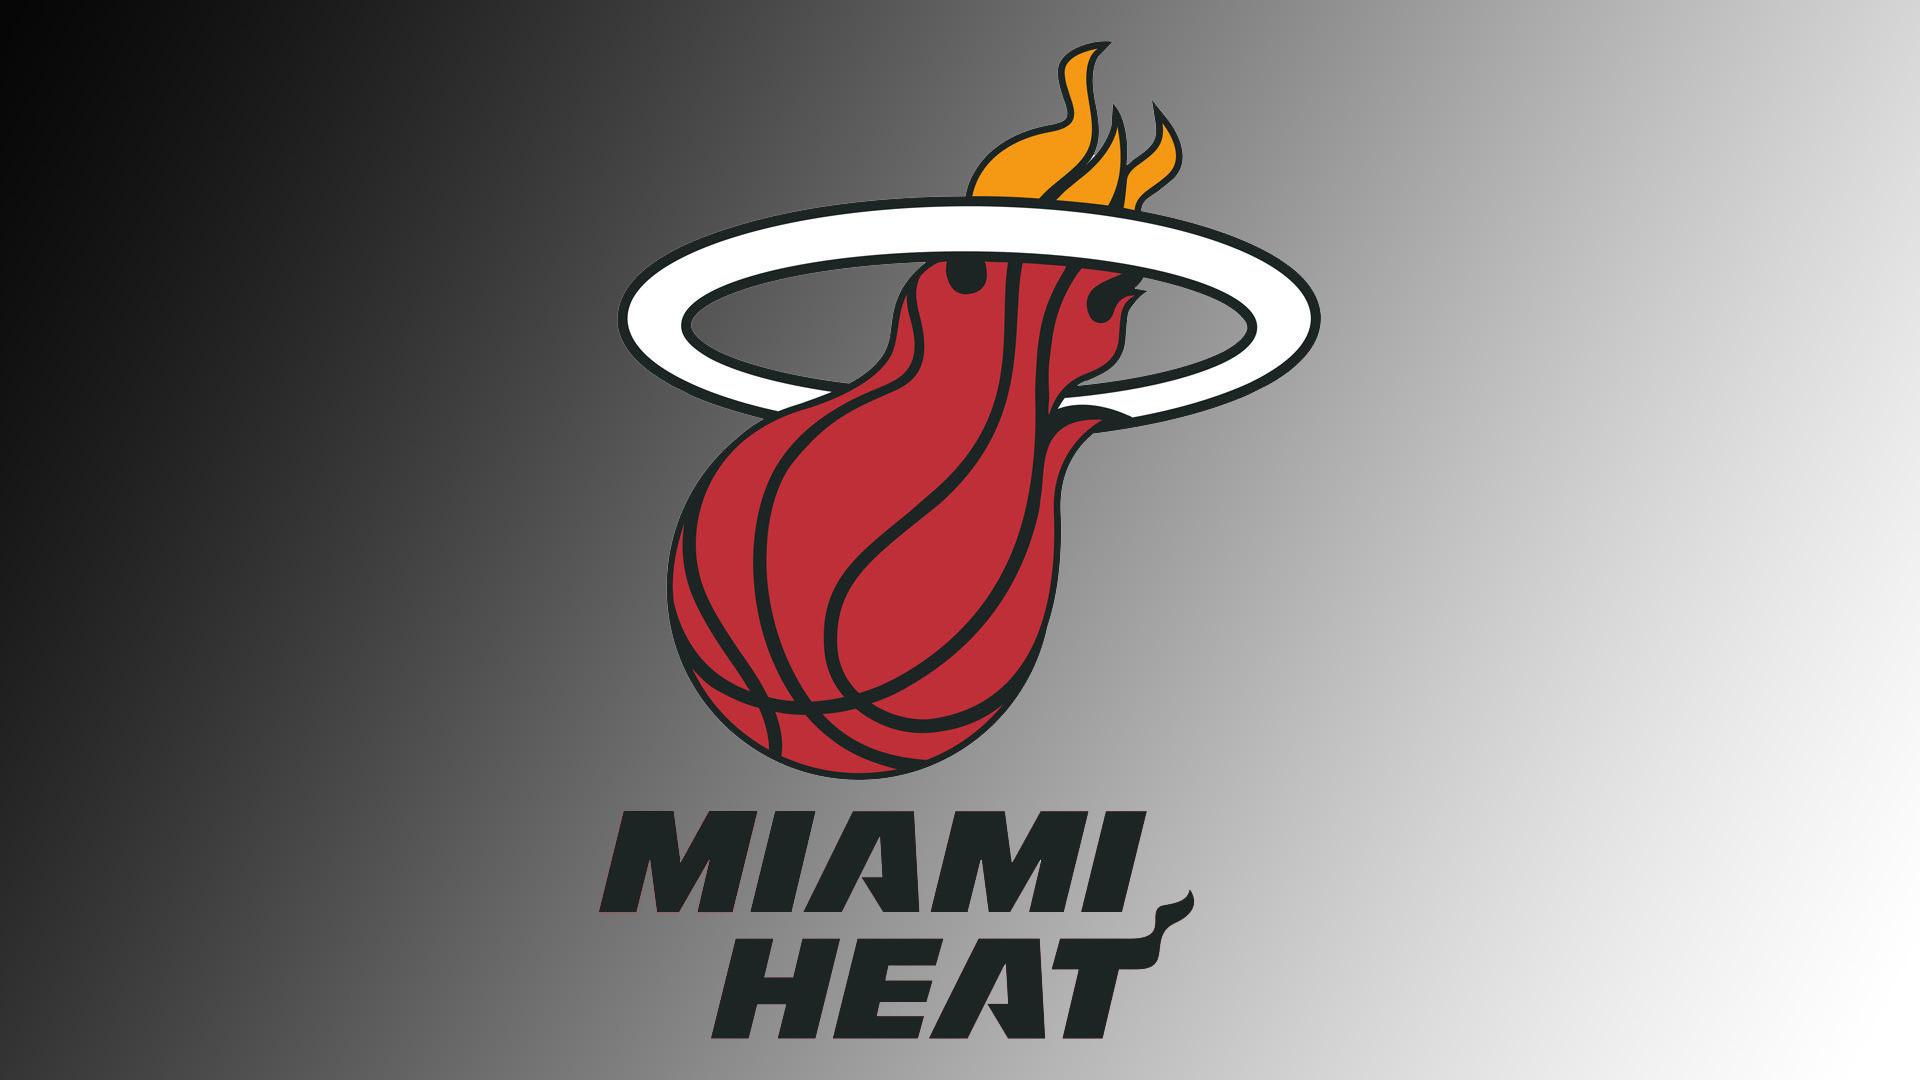 Miami Heat Logo Wallpaper 2018 (70+ images)